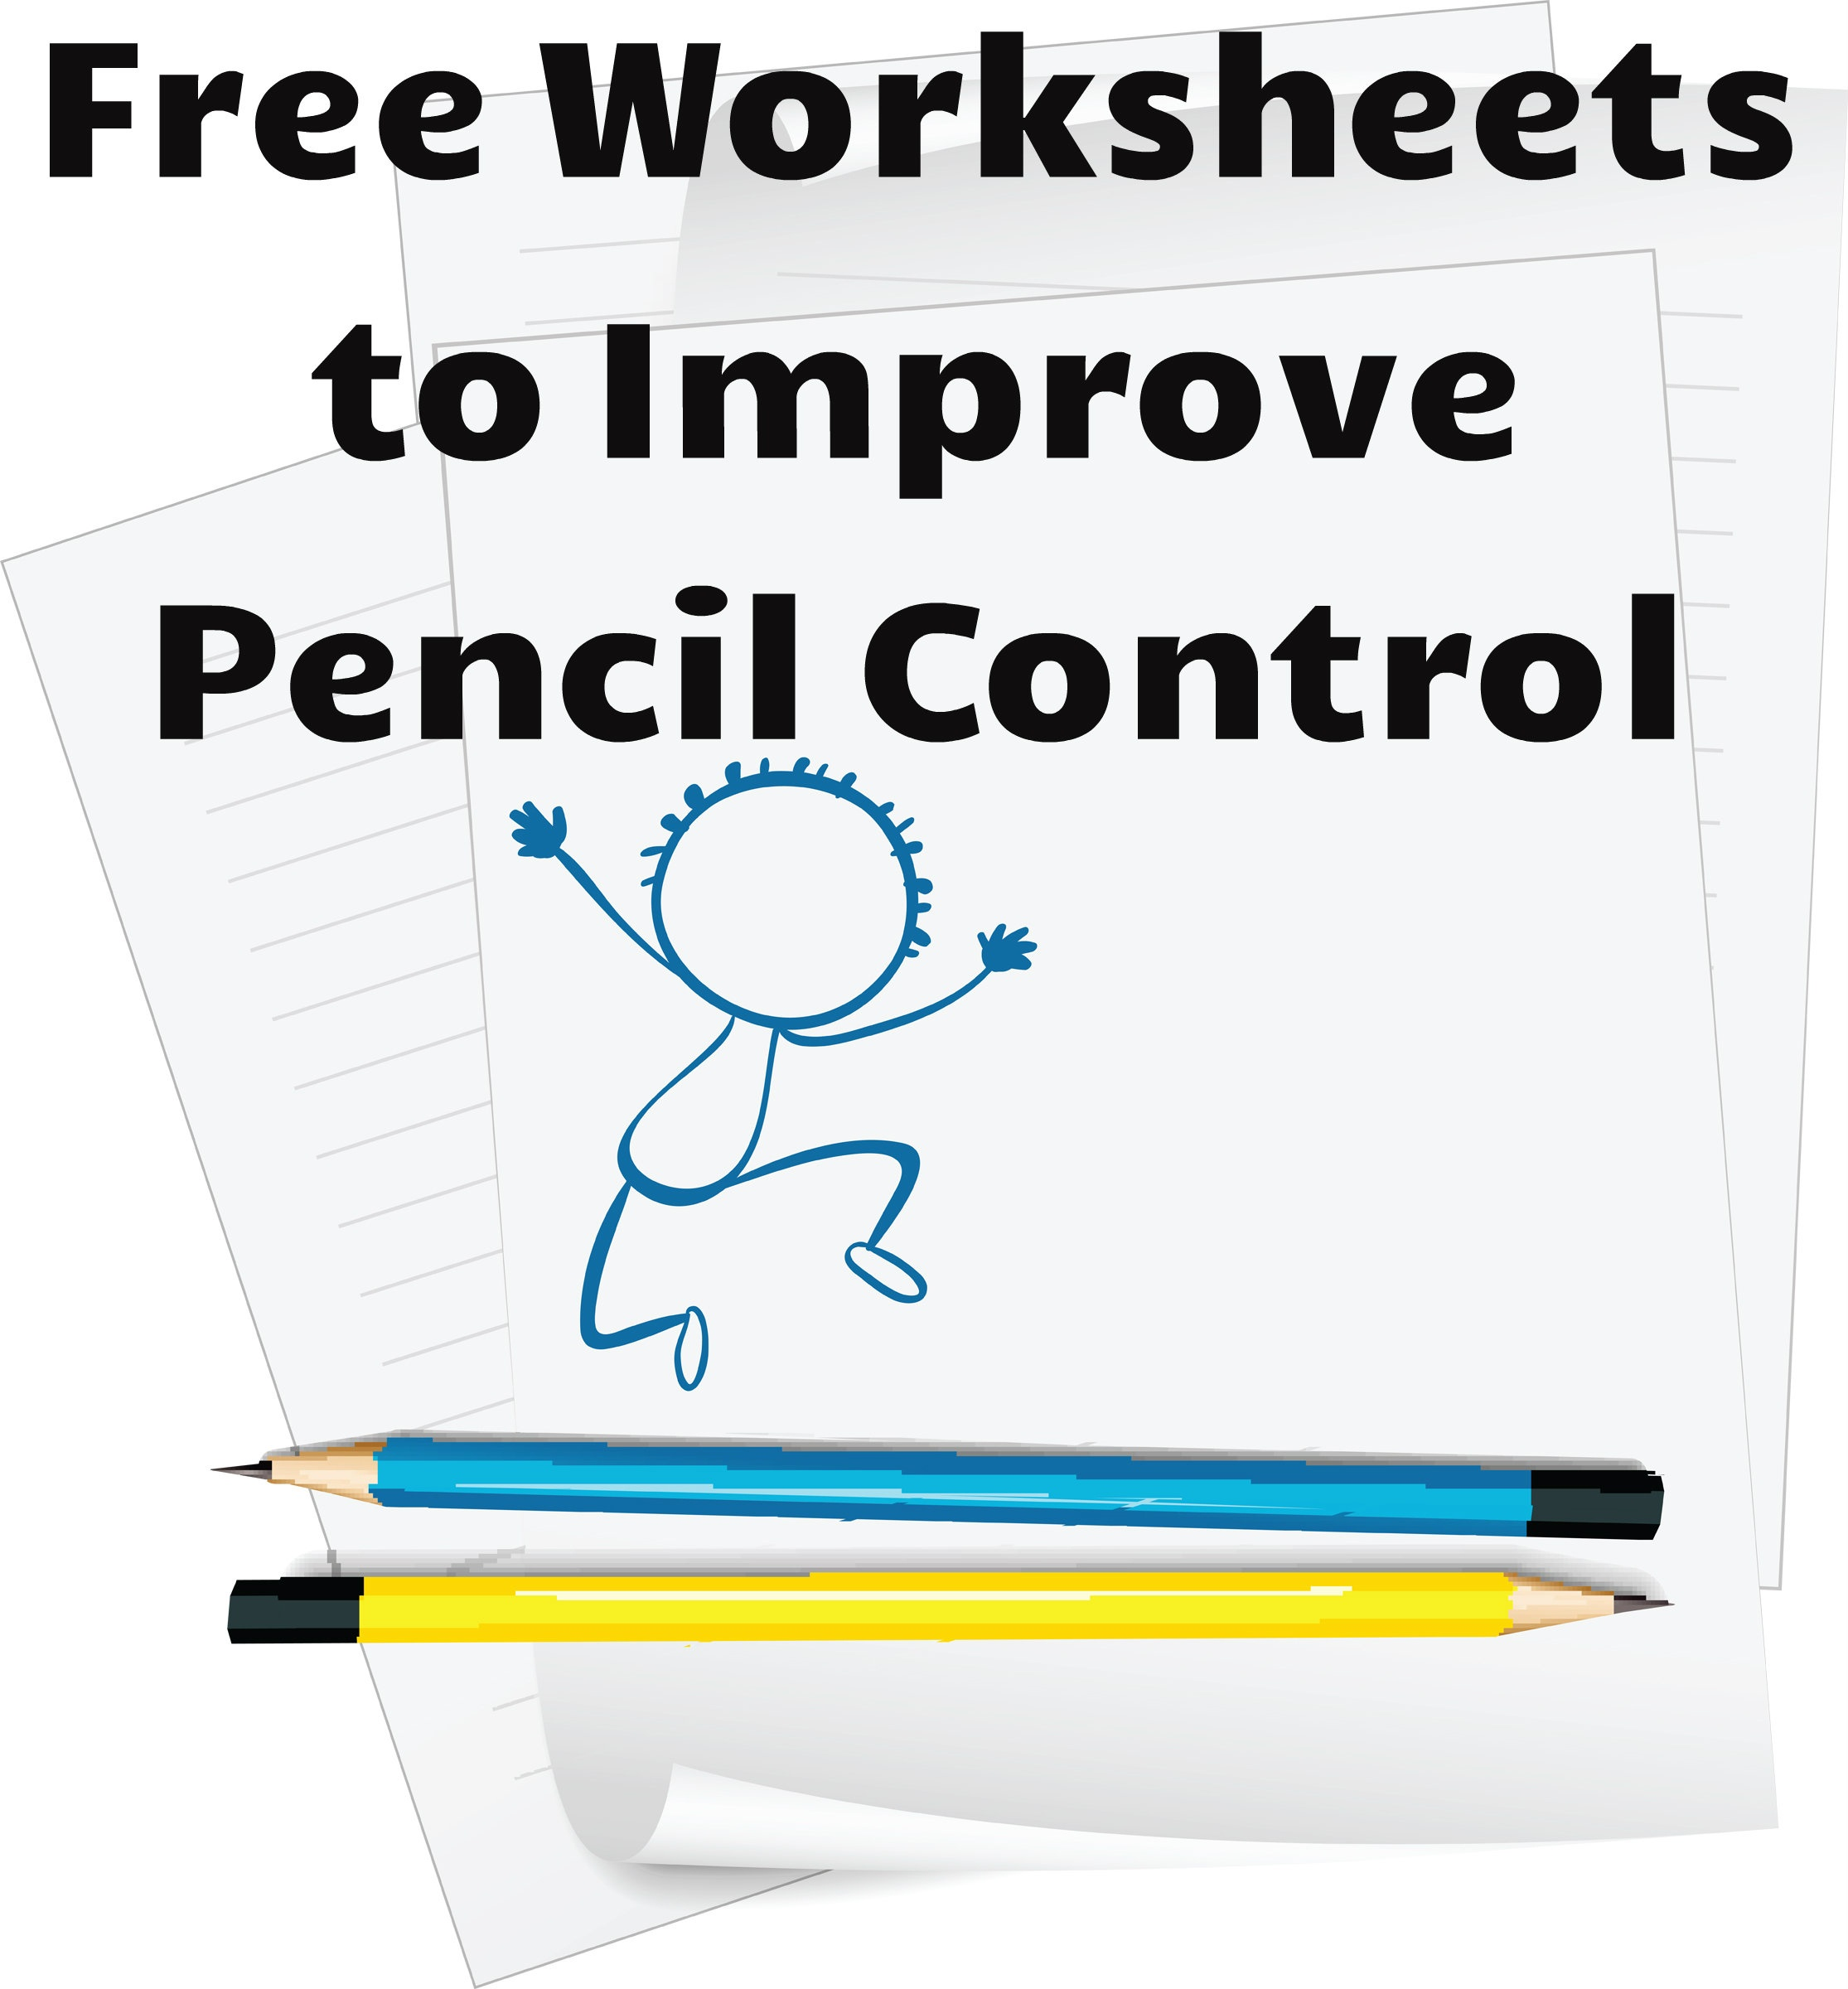 Fine Motor Skills Practice | Readyteacher - Free Printable Fine Motor Skills Worksheets